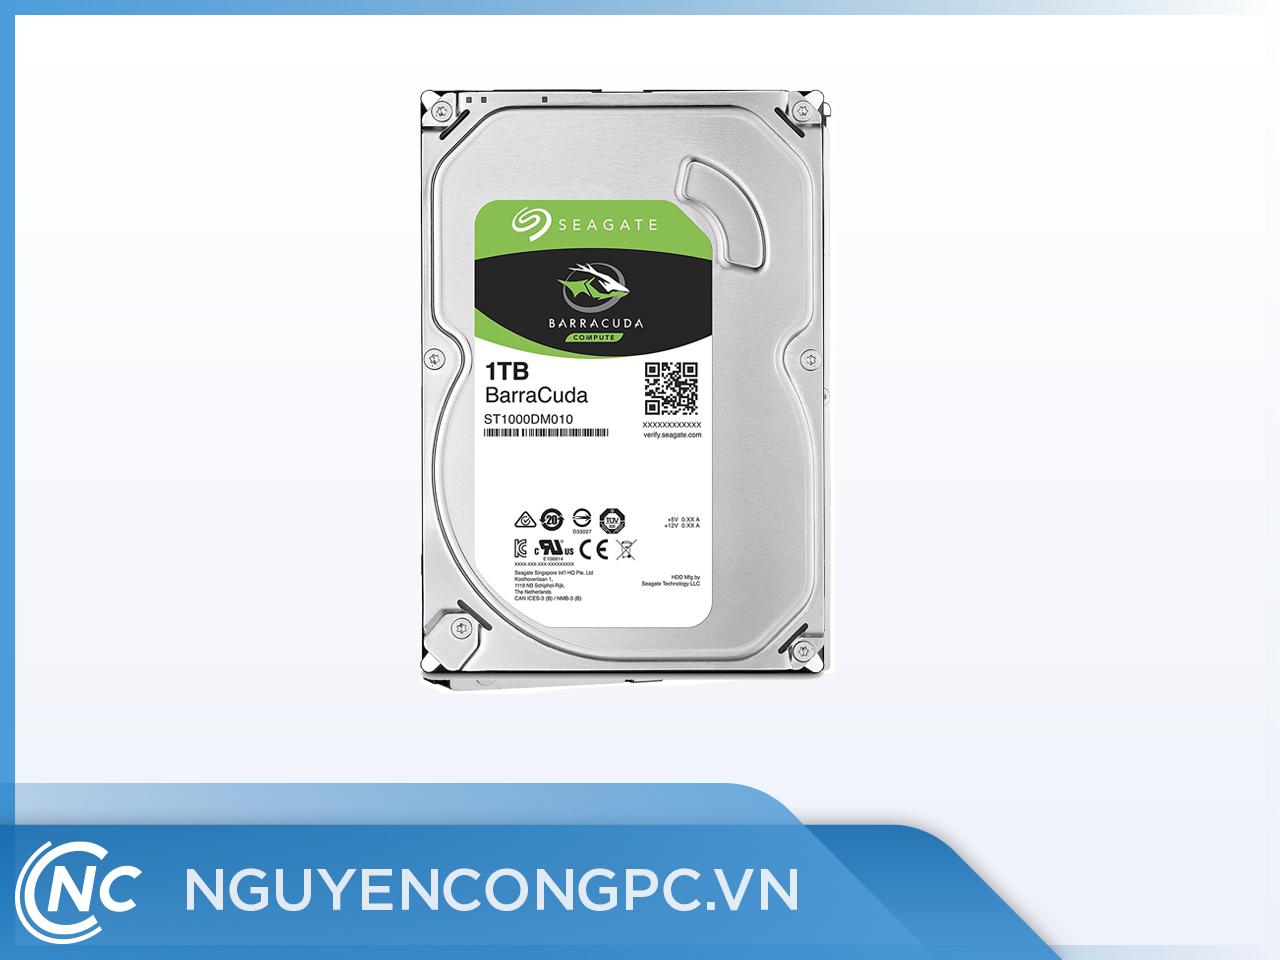 ổ cứng HDD Seagate 1TB 7200rpm, Sata3 64MB Cache